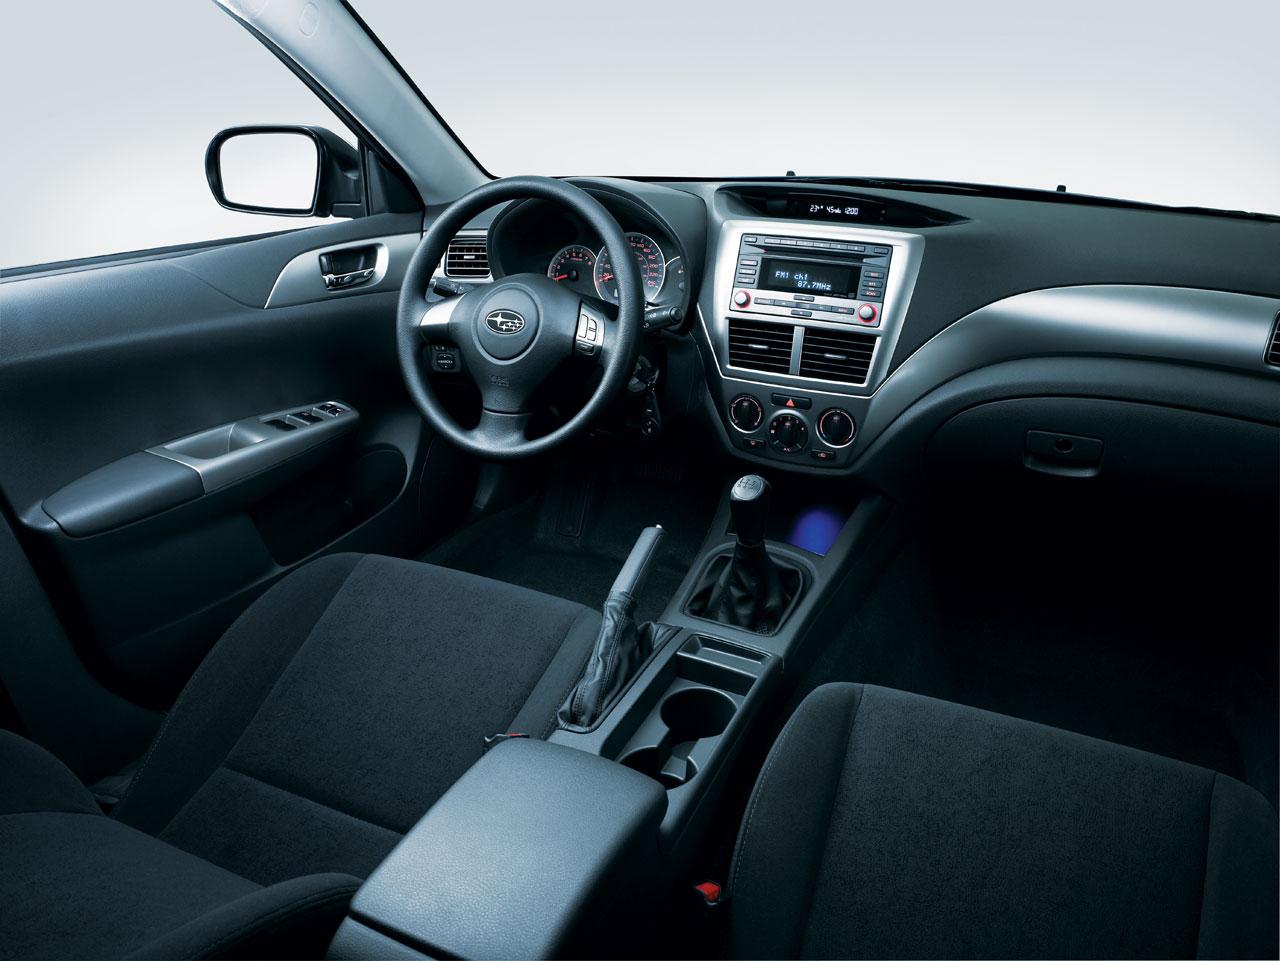 Subaru Impreza 2.0 MT